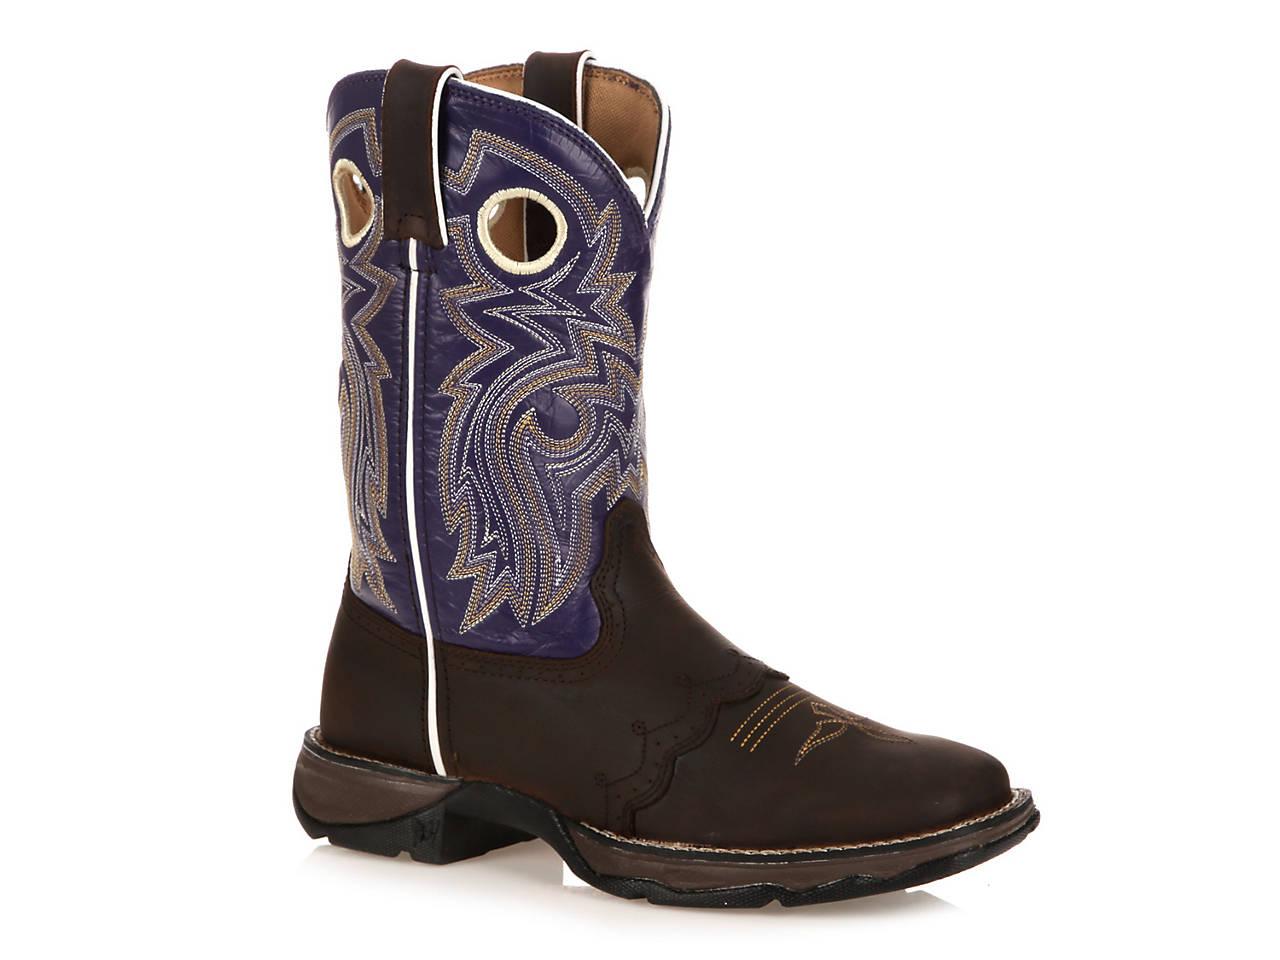 844bedb47d5d17 Durango Twilight Western Cowboy Boot Women s Shoes